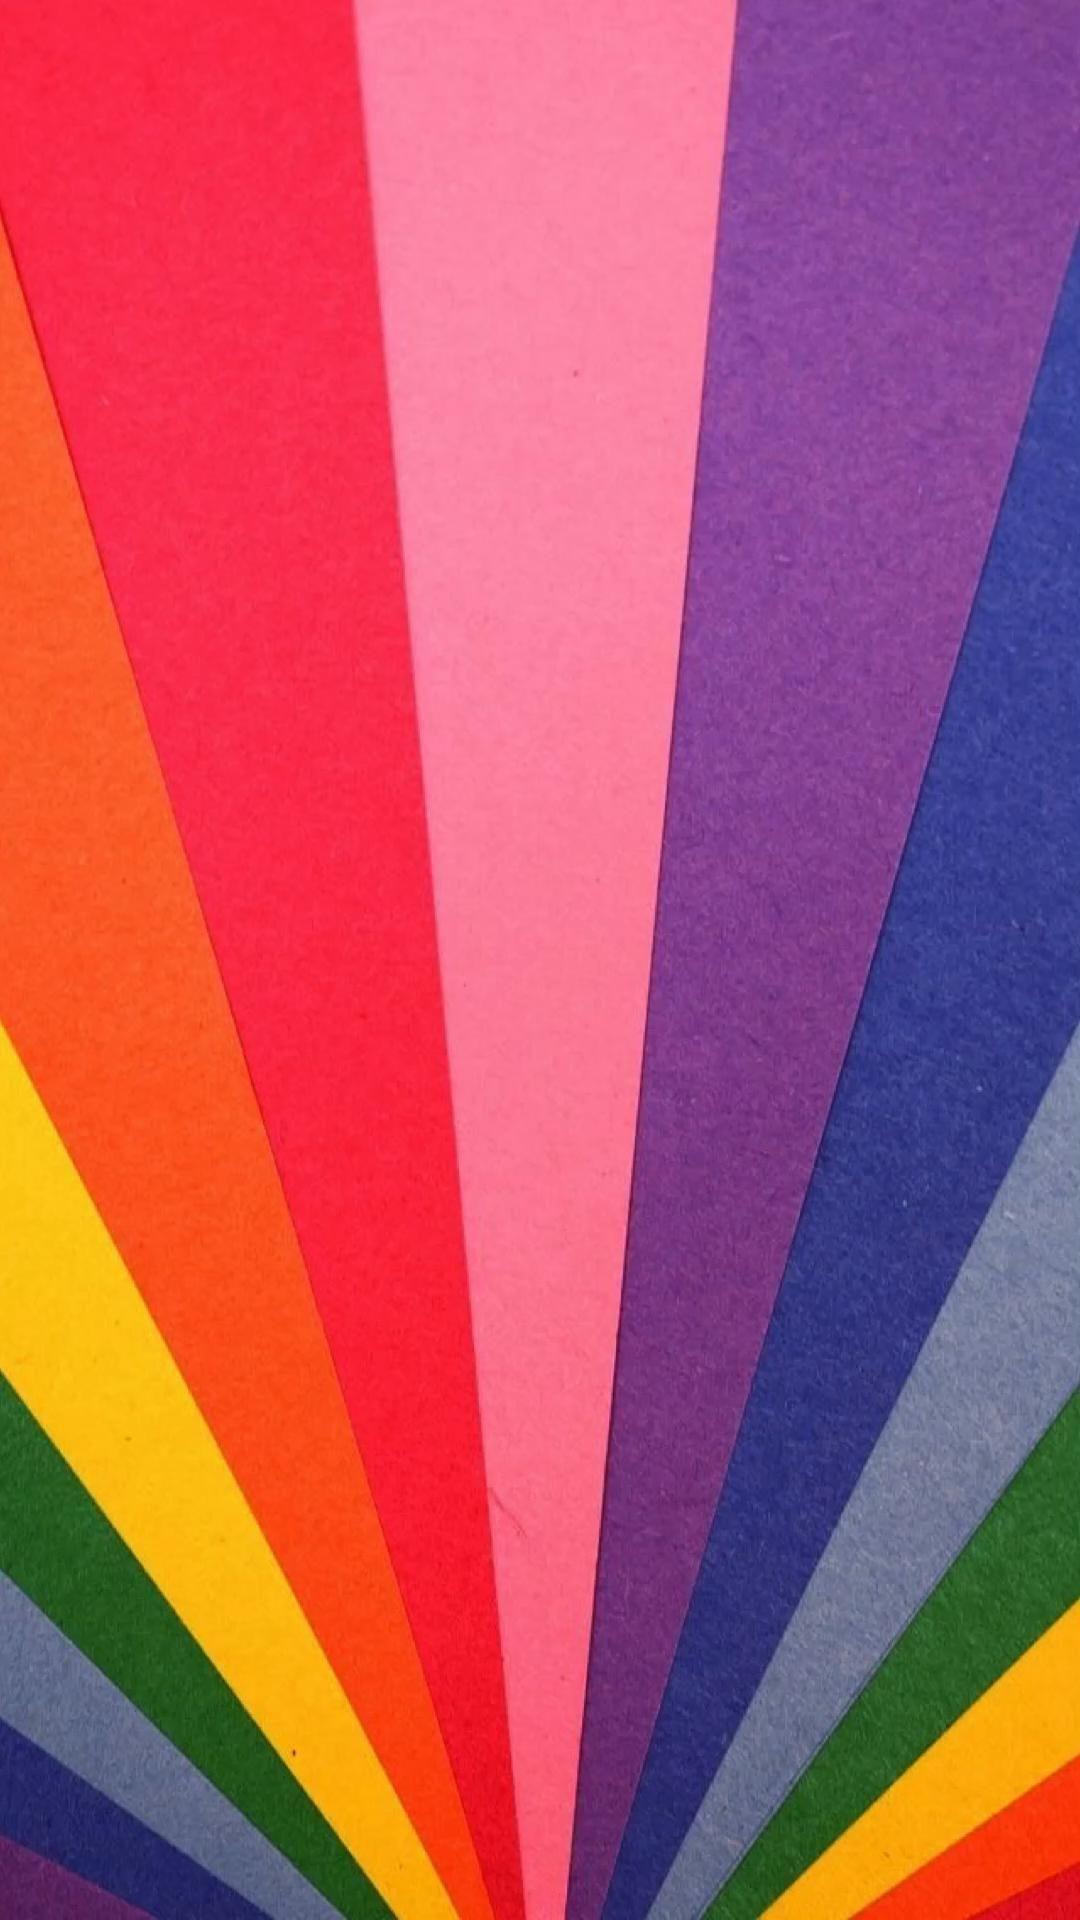 Best Rainbow Wallpapers 🌈